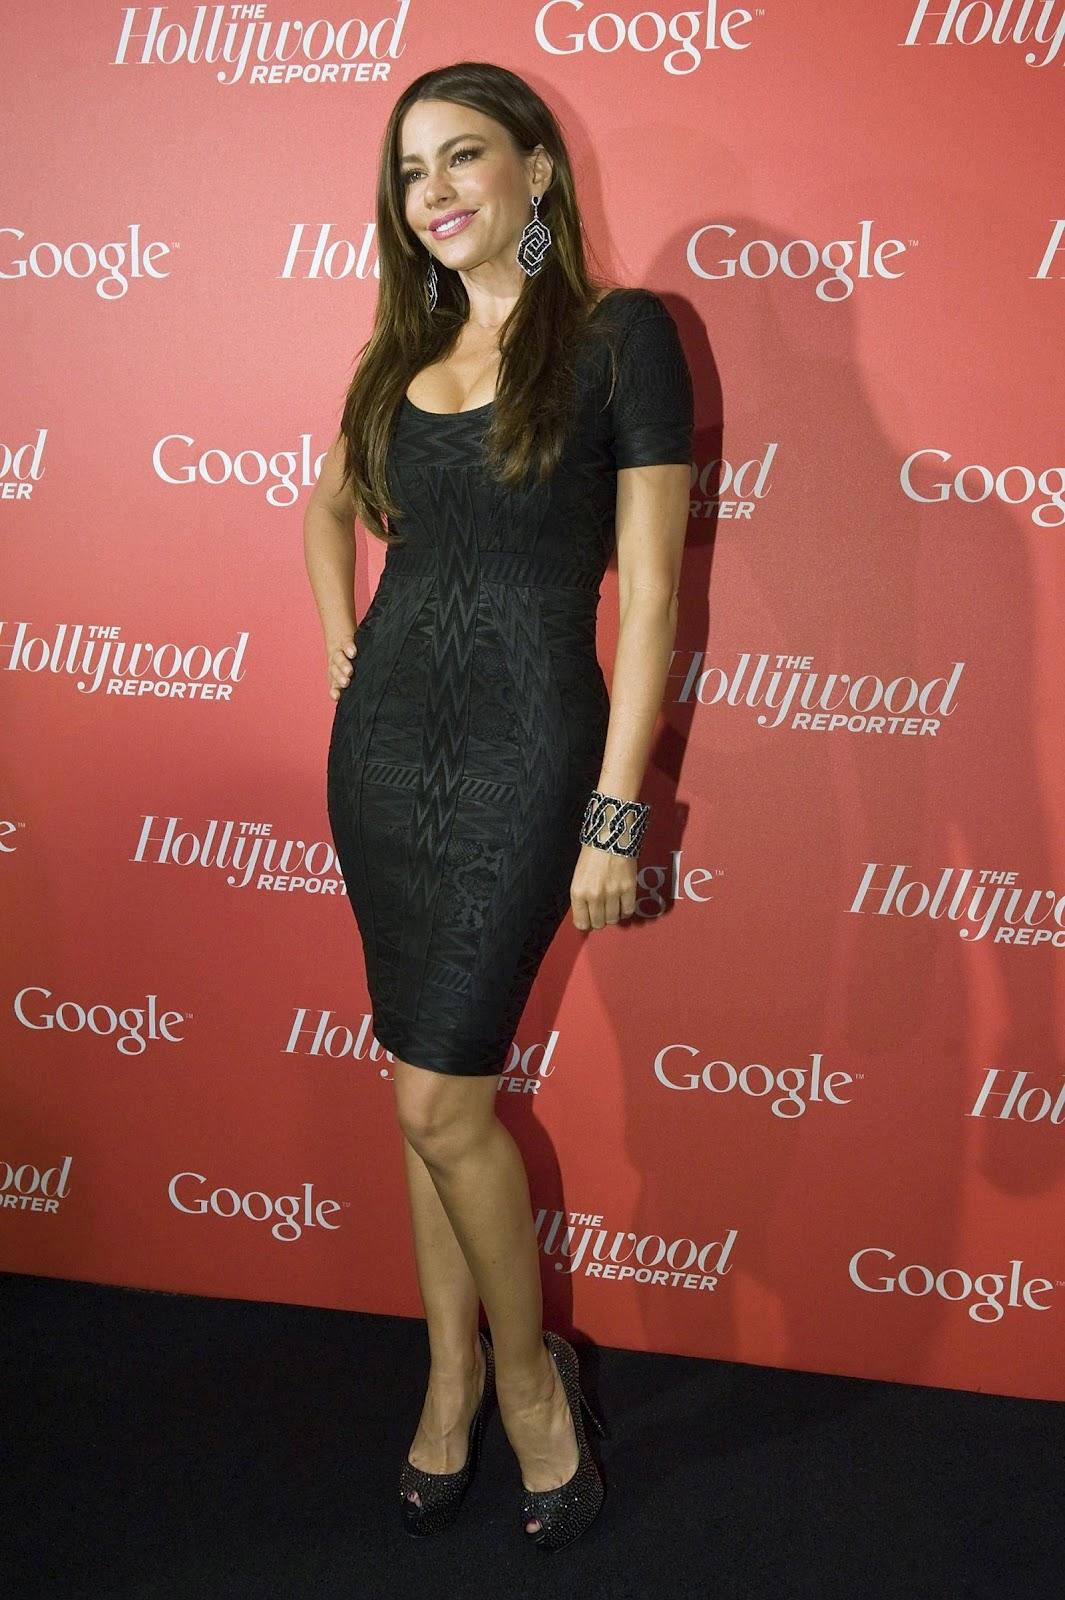 http://2.bp.blogspot.com/-9wI0bWggBhw/T5w1oblrUZI/AAAAAAAAIRM/GzZ_8y9Rlos/s1600/Sofia-Vergara-Google-Hollywood-Reporter-Event-3.jpg